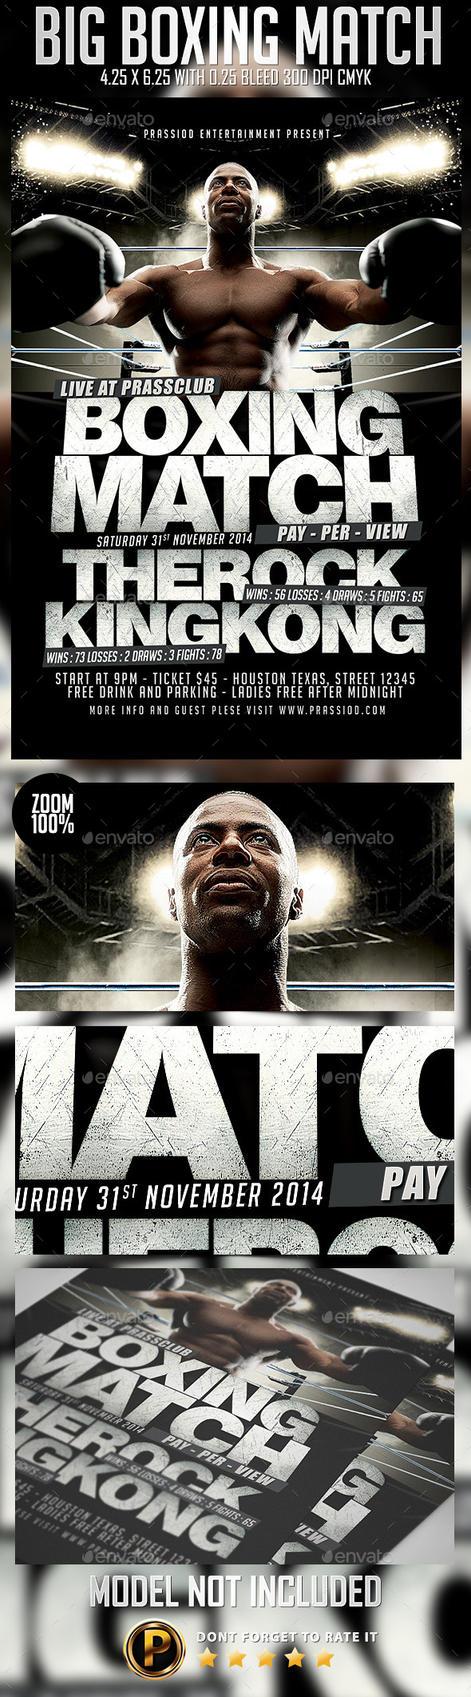 Big Boxing Match Flyer Template by prassetyo